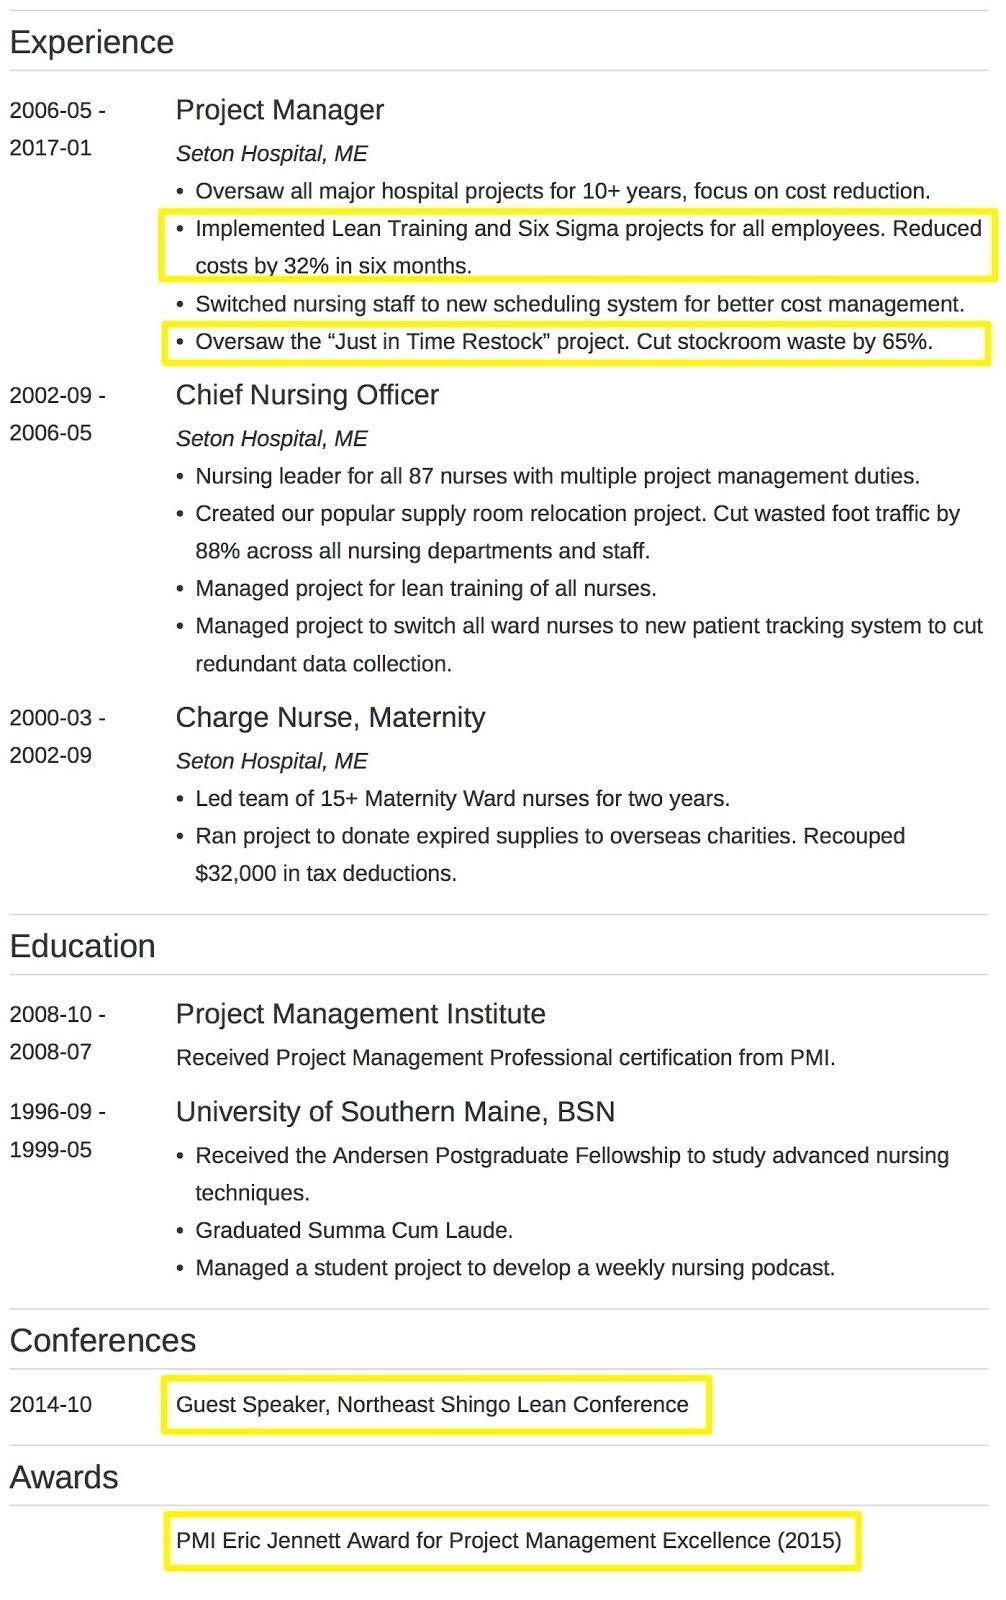 Resume Format Qualifications Resume summary statement